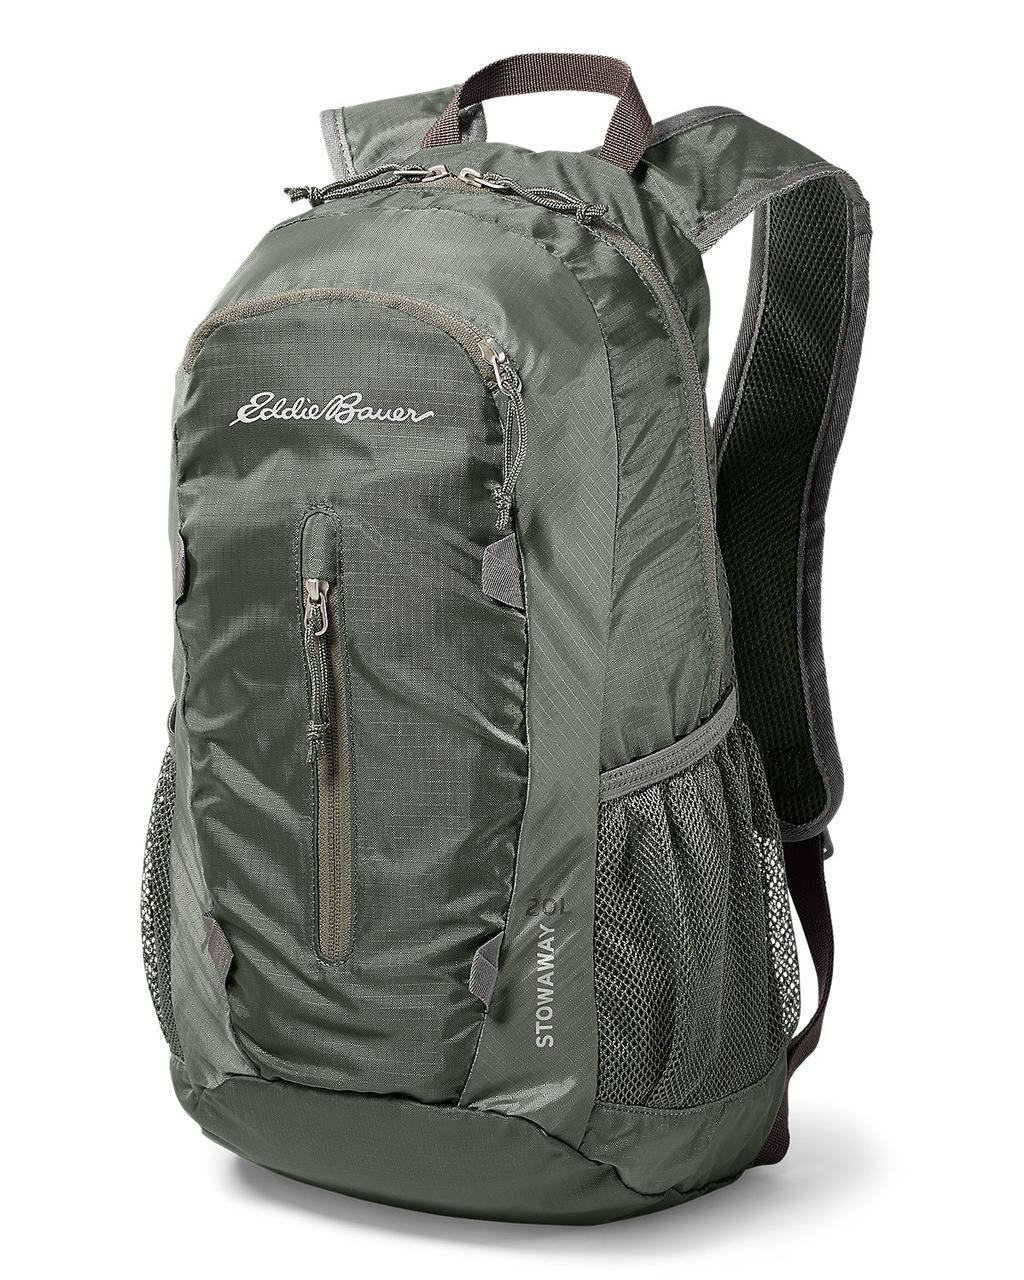 Рюкзак Eddie Bauer Stowaway 20L Backpack Capers